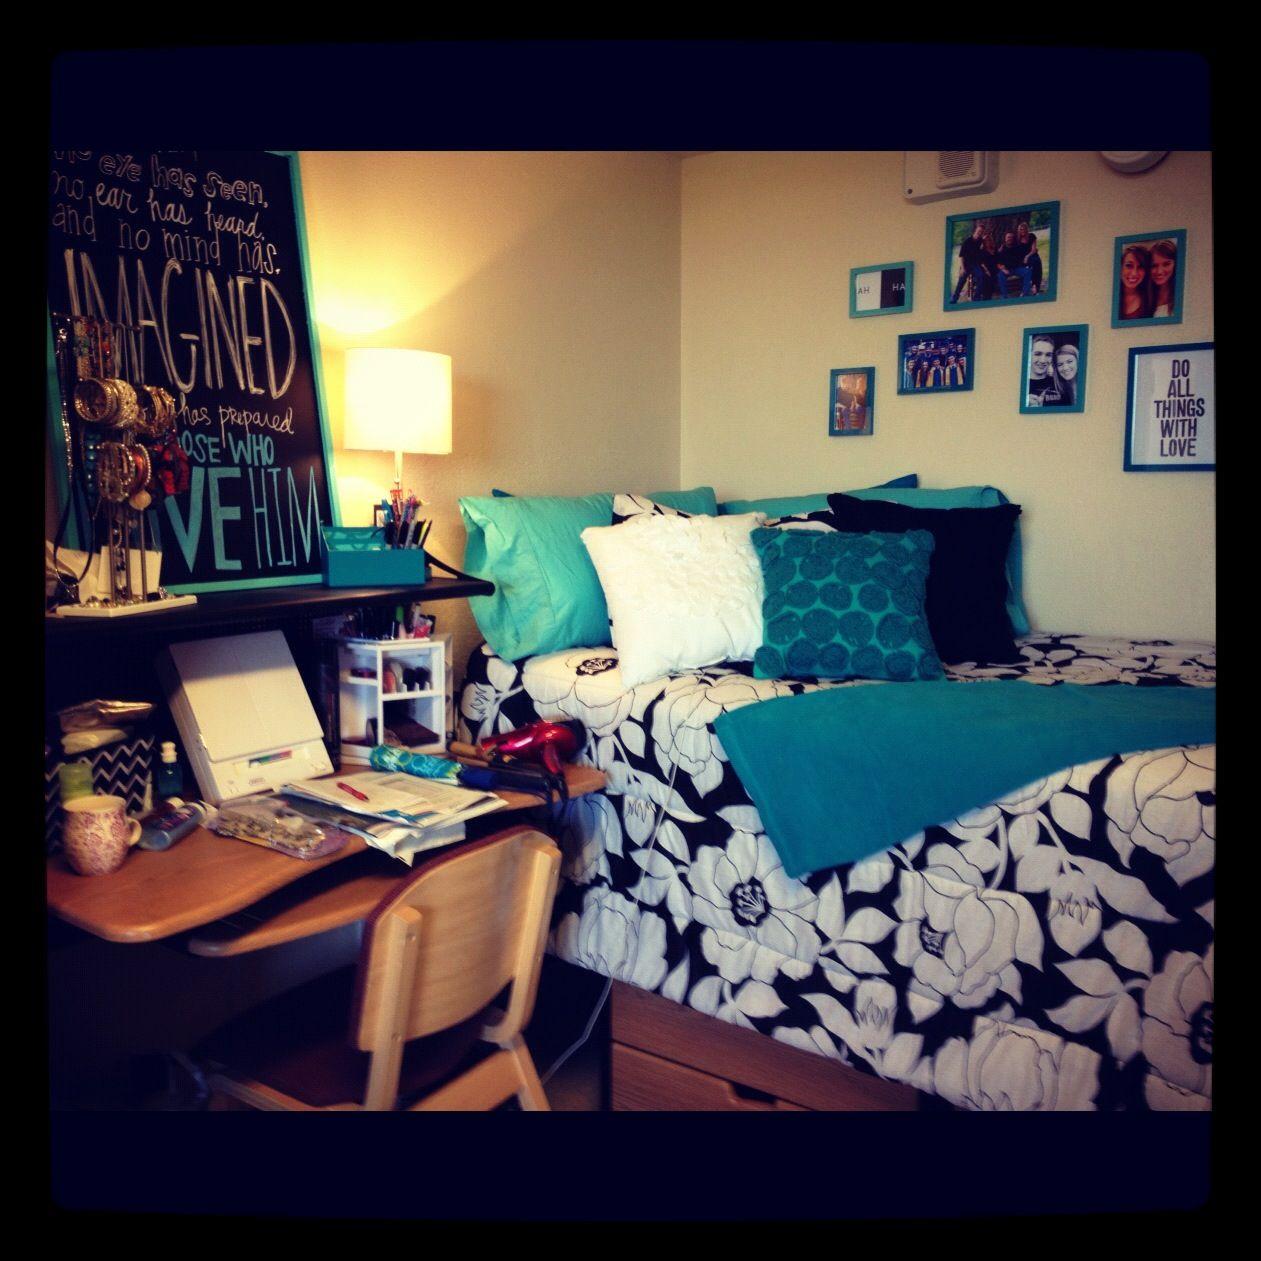 Colorful Dorm Room: Dorm Room, College Dorm Rooms, Dorm